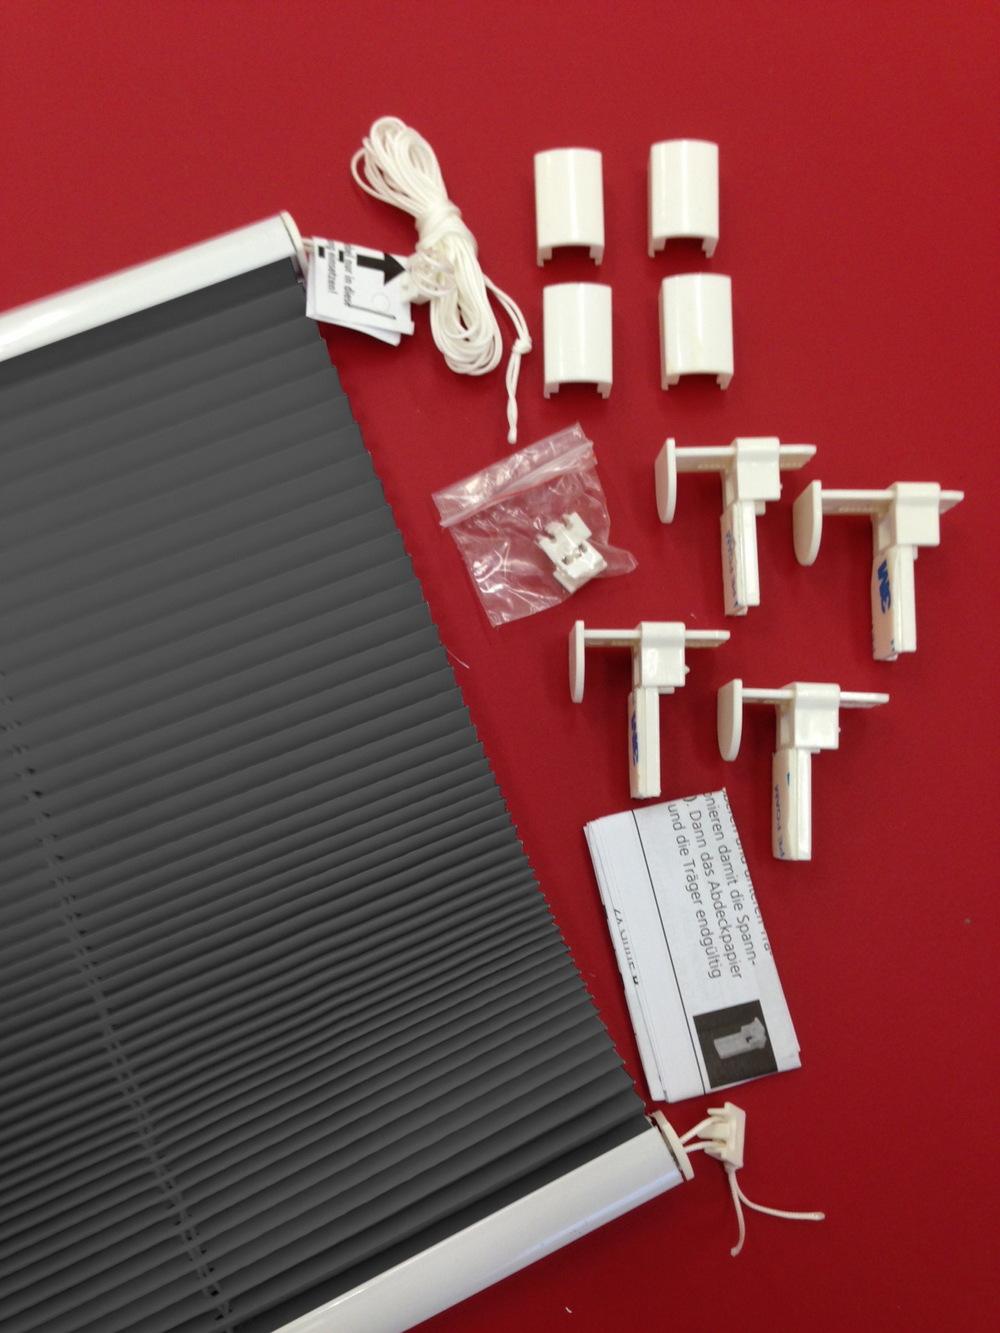 plissee f r fenster t r faltrollo klemmfix ohne bohren. Black Bedroom Furniture Sets. Home Design Ideas